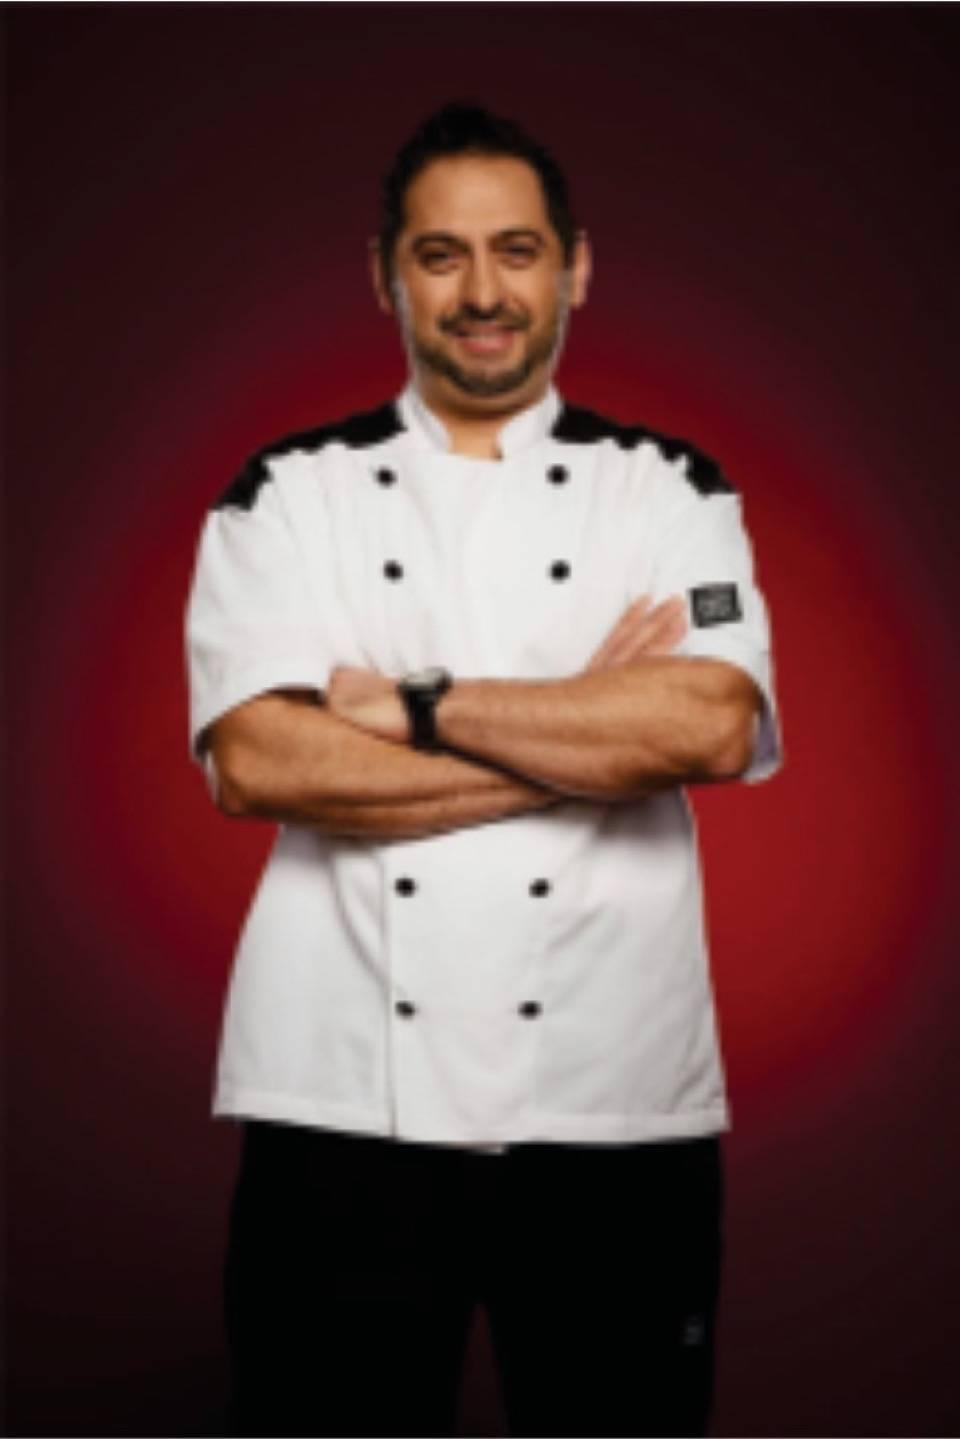 Executive Chef Giovanni Filippone Returns To Season 17 Of